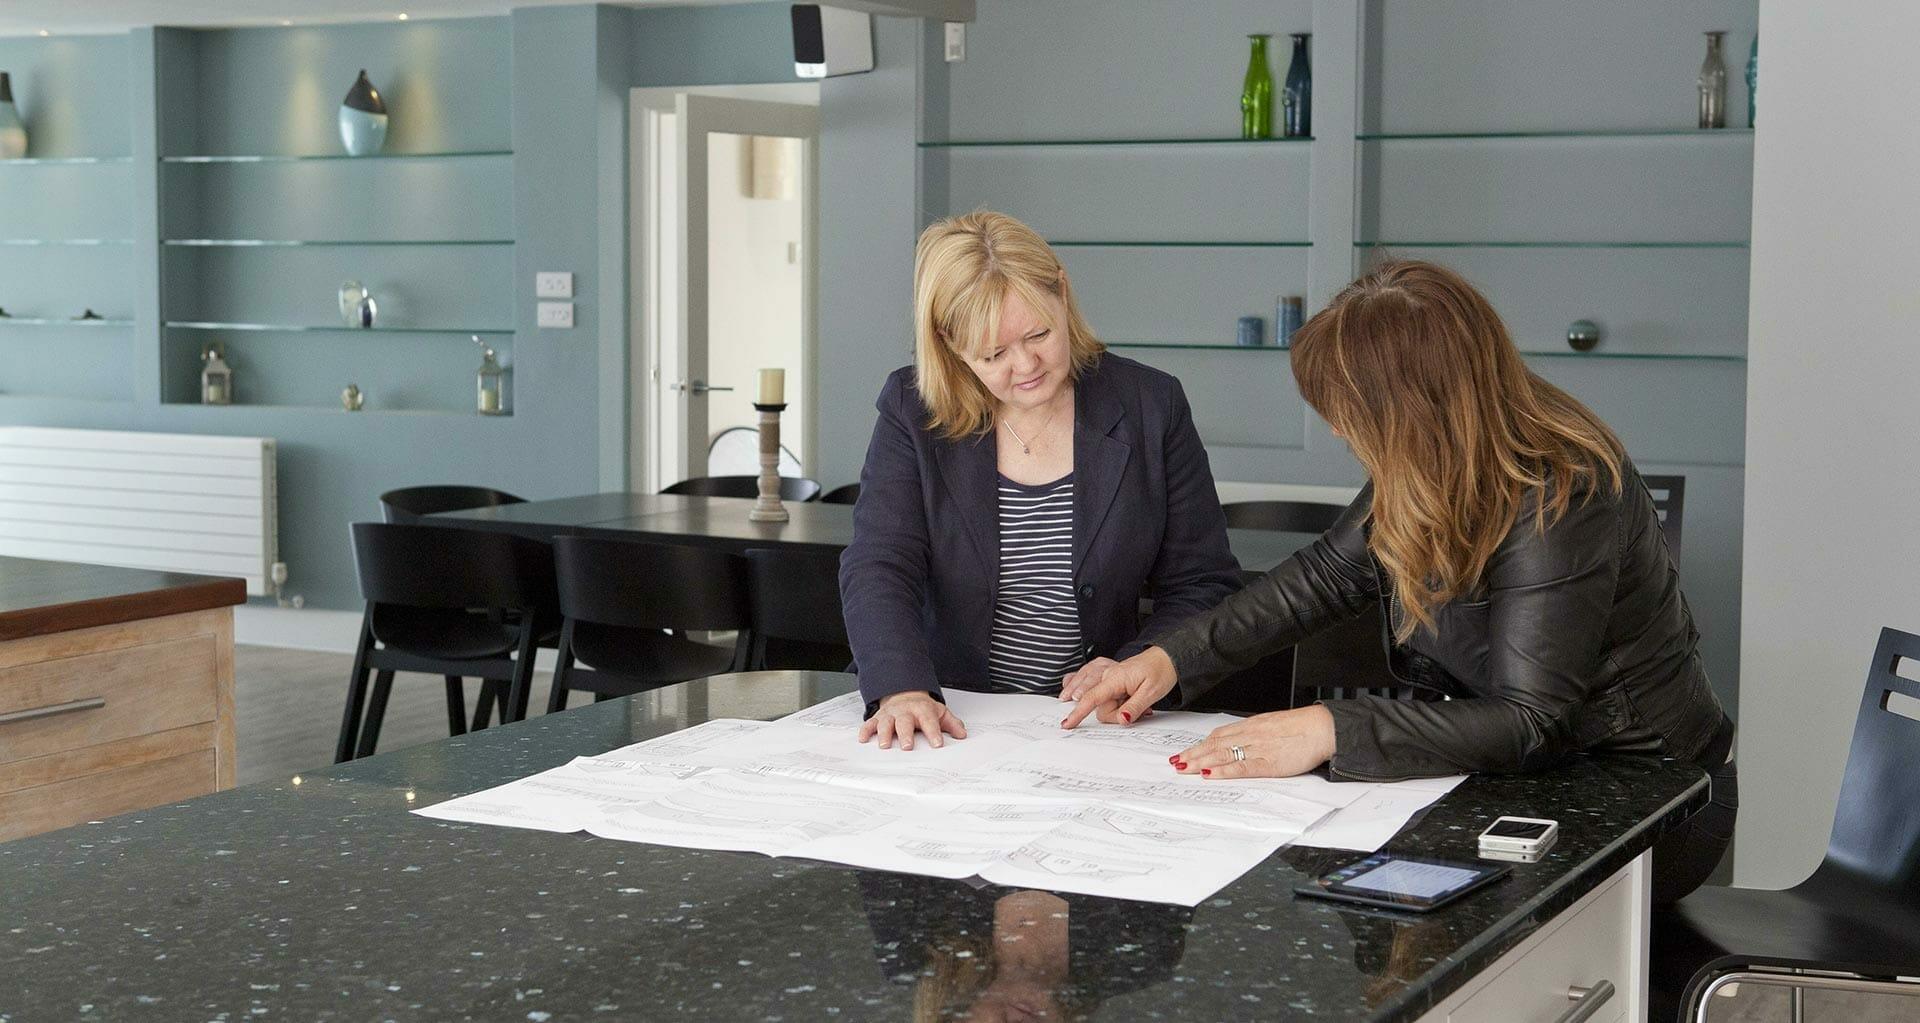 How to choose an interior designer – checklist